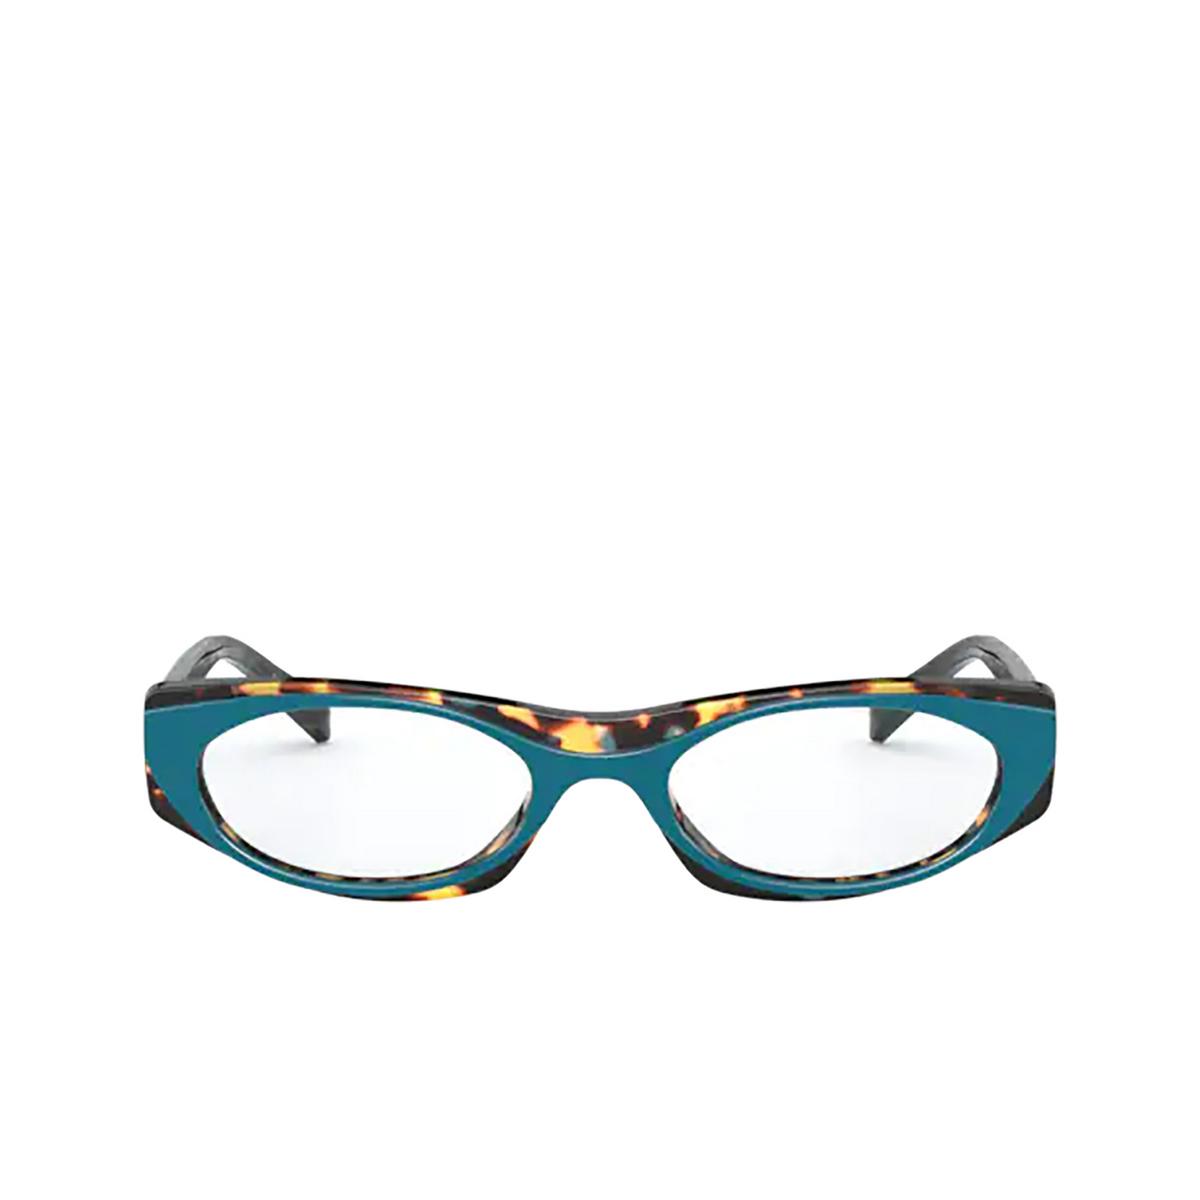 Vogue® Oval Eyeglasses: VO5316 color Top Green / Multi Blue Havana 2816 - front view.